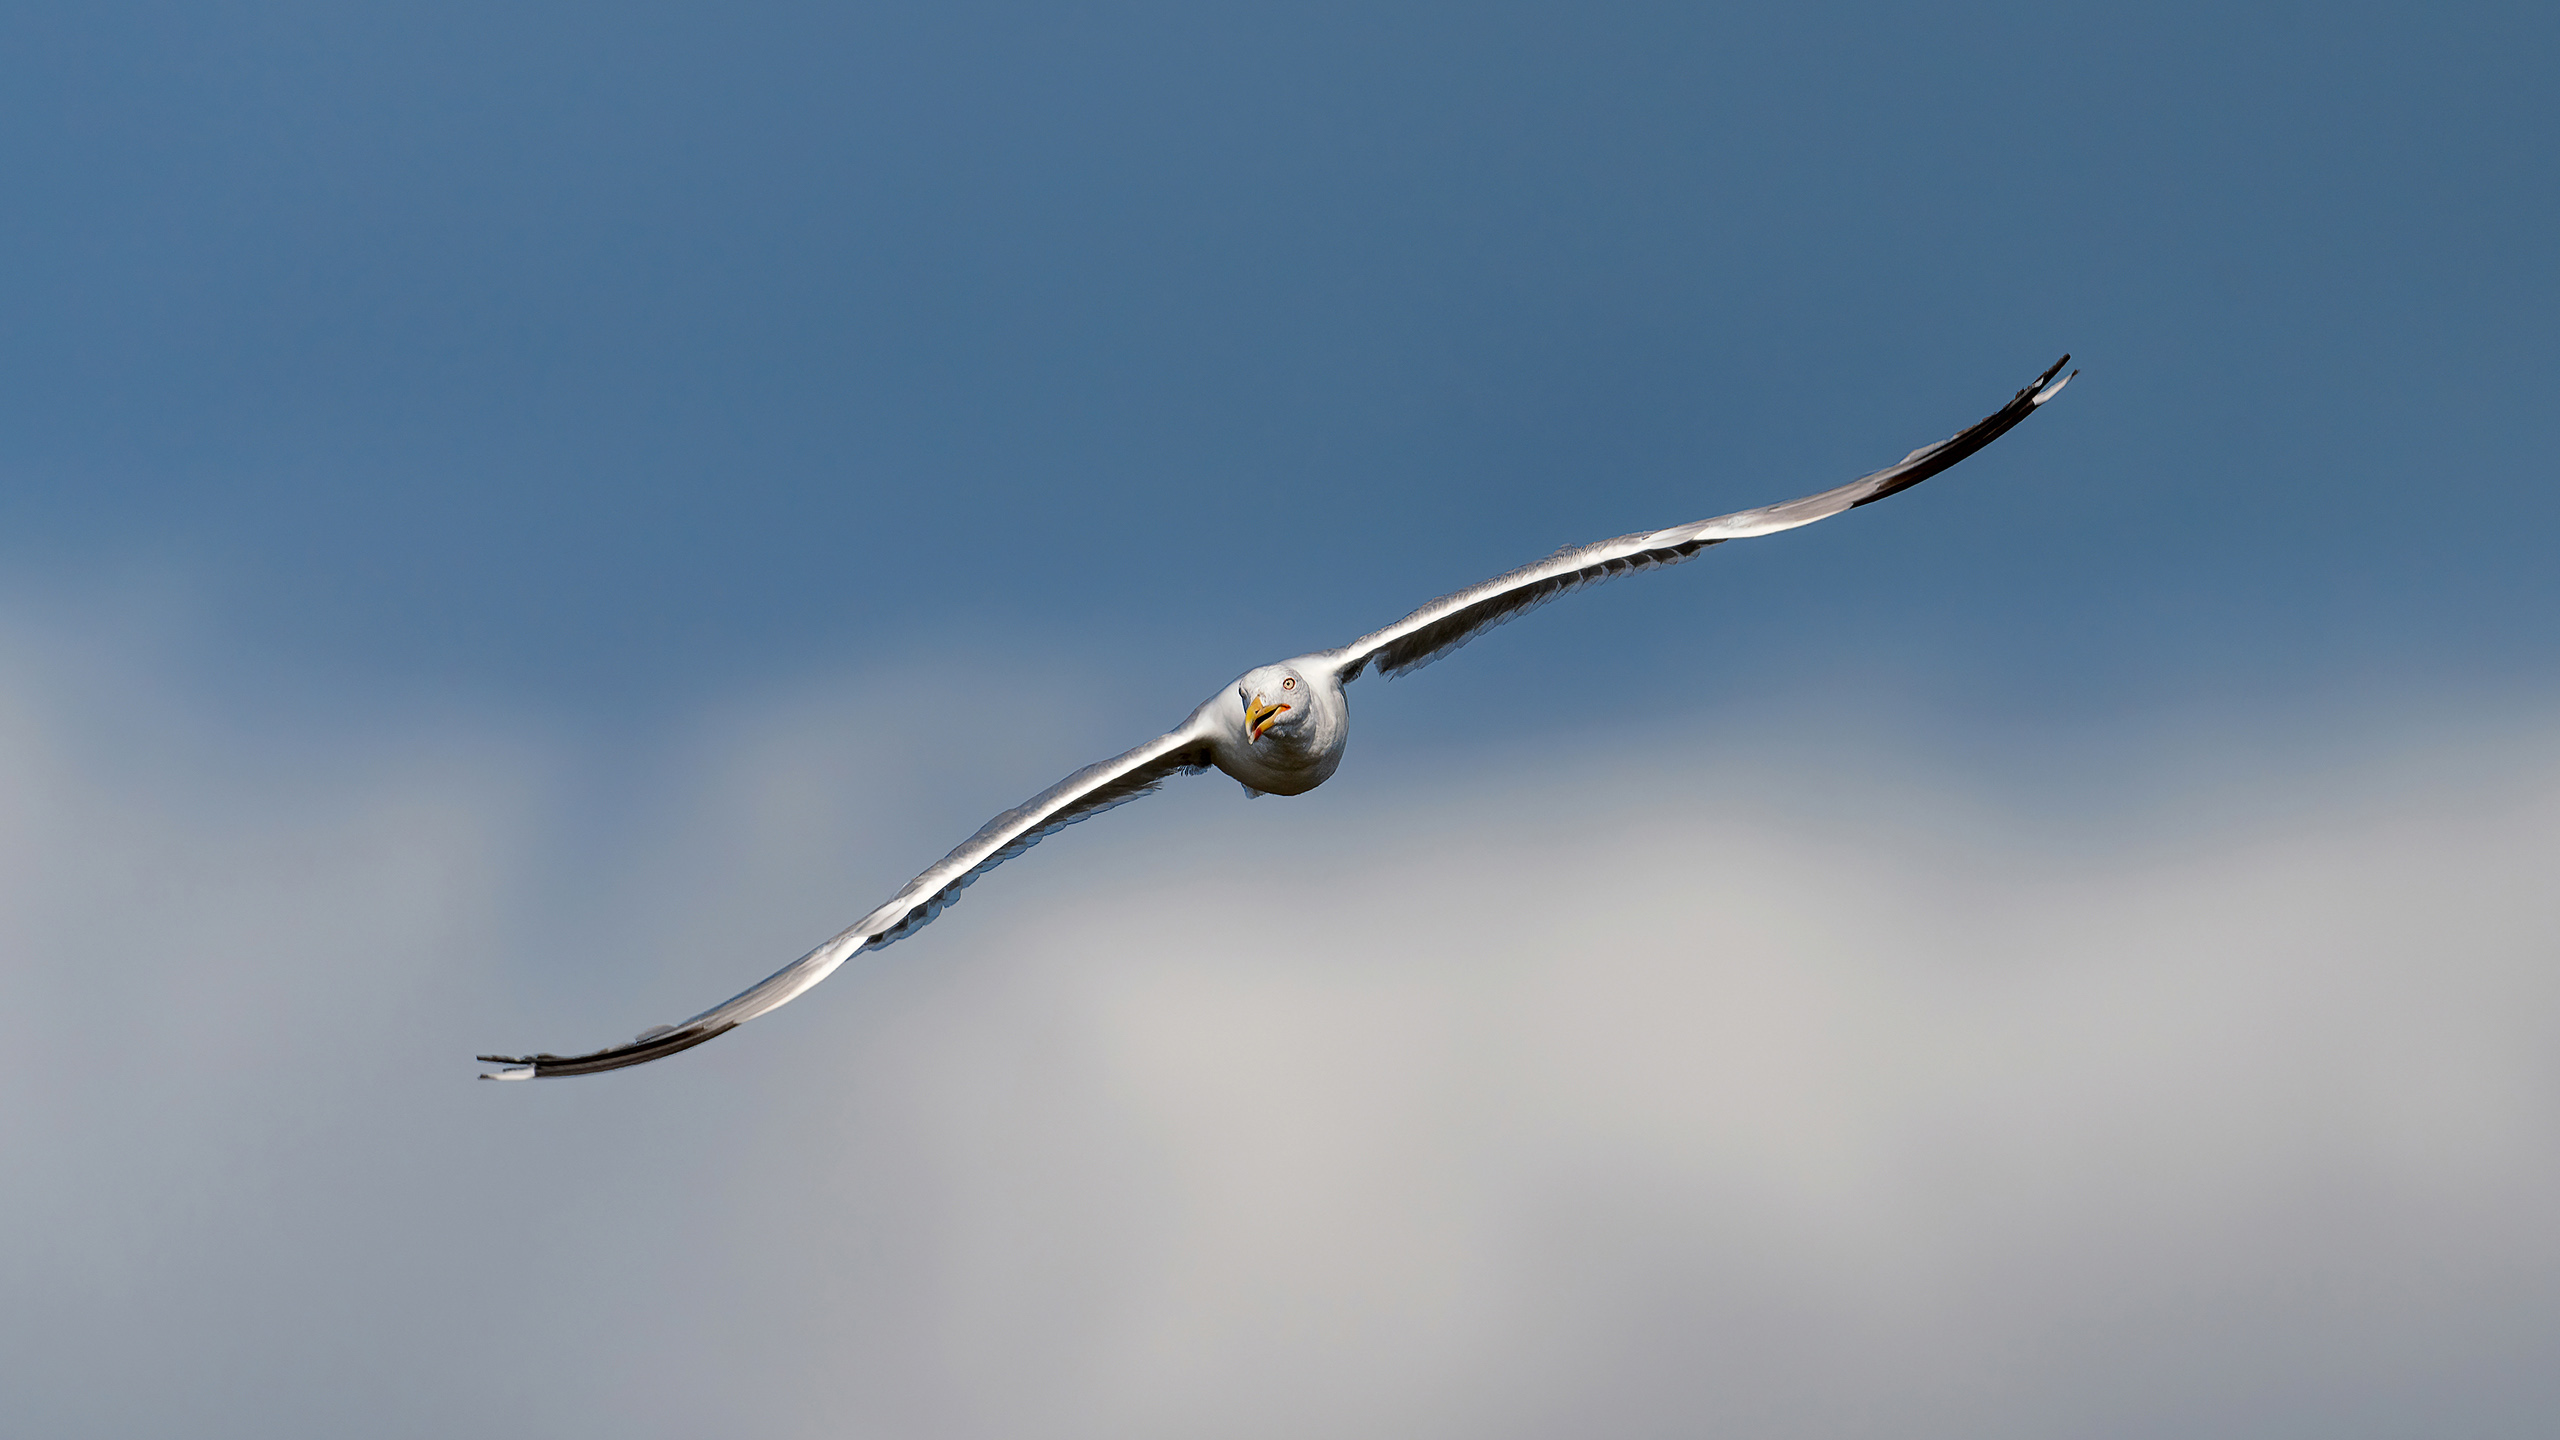 gaviota patiamarilla vuelo